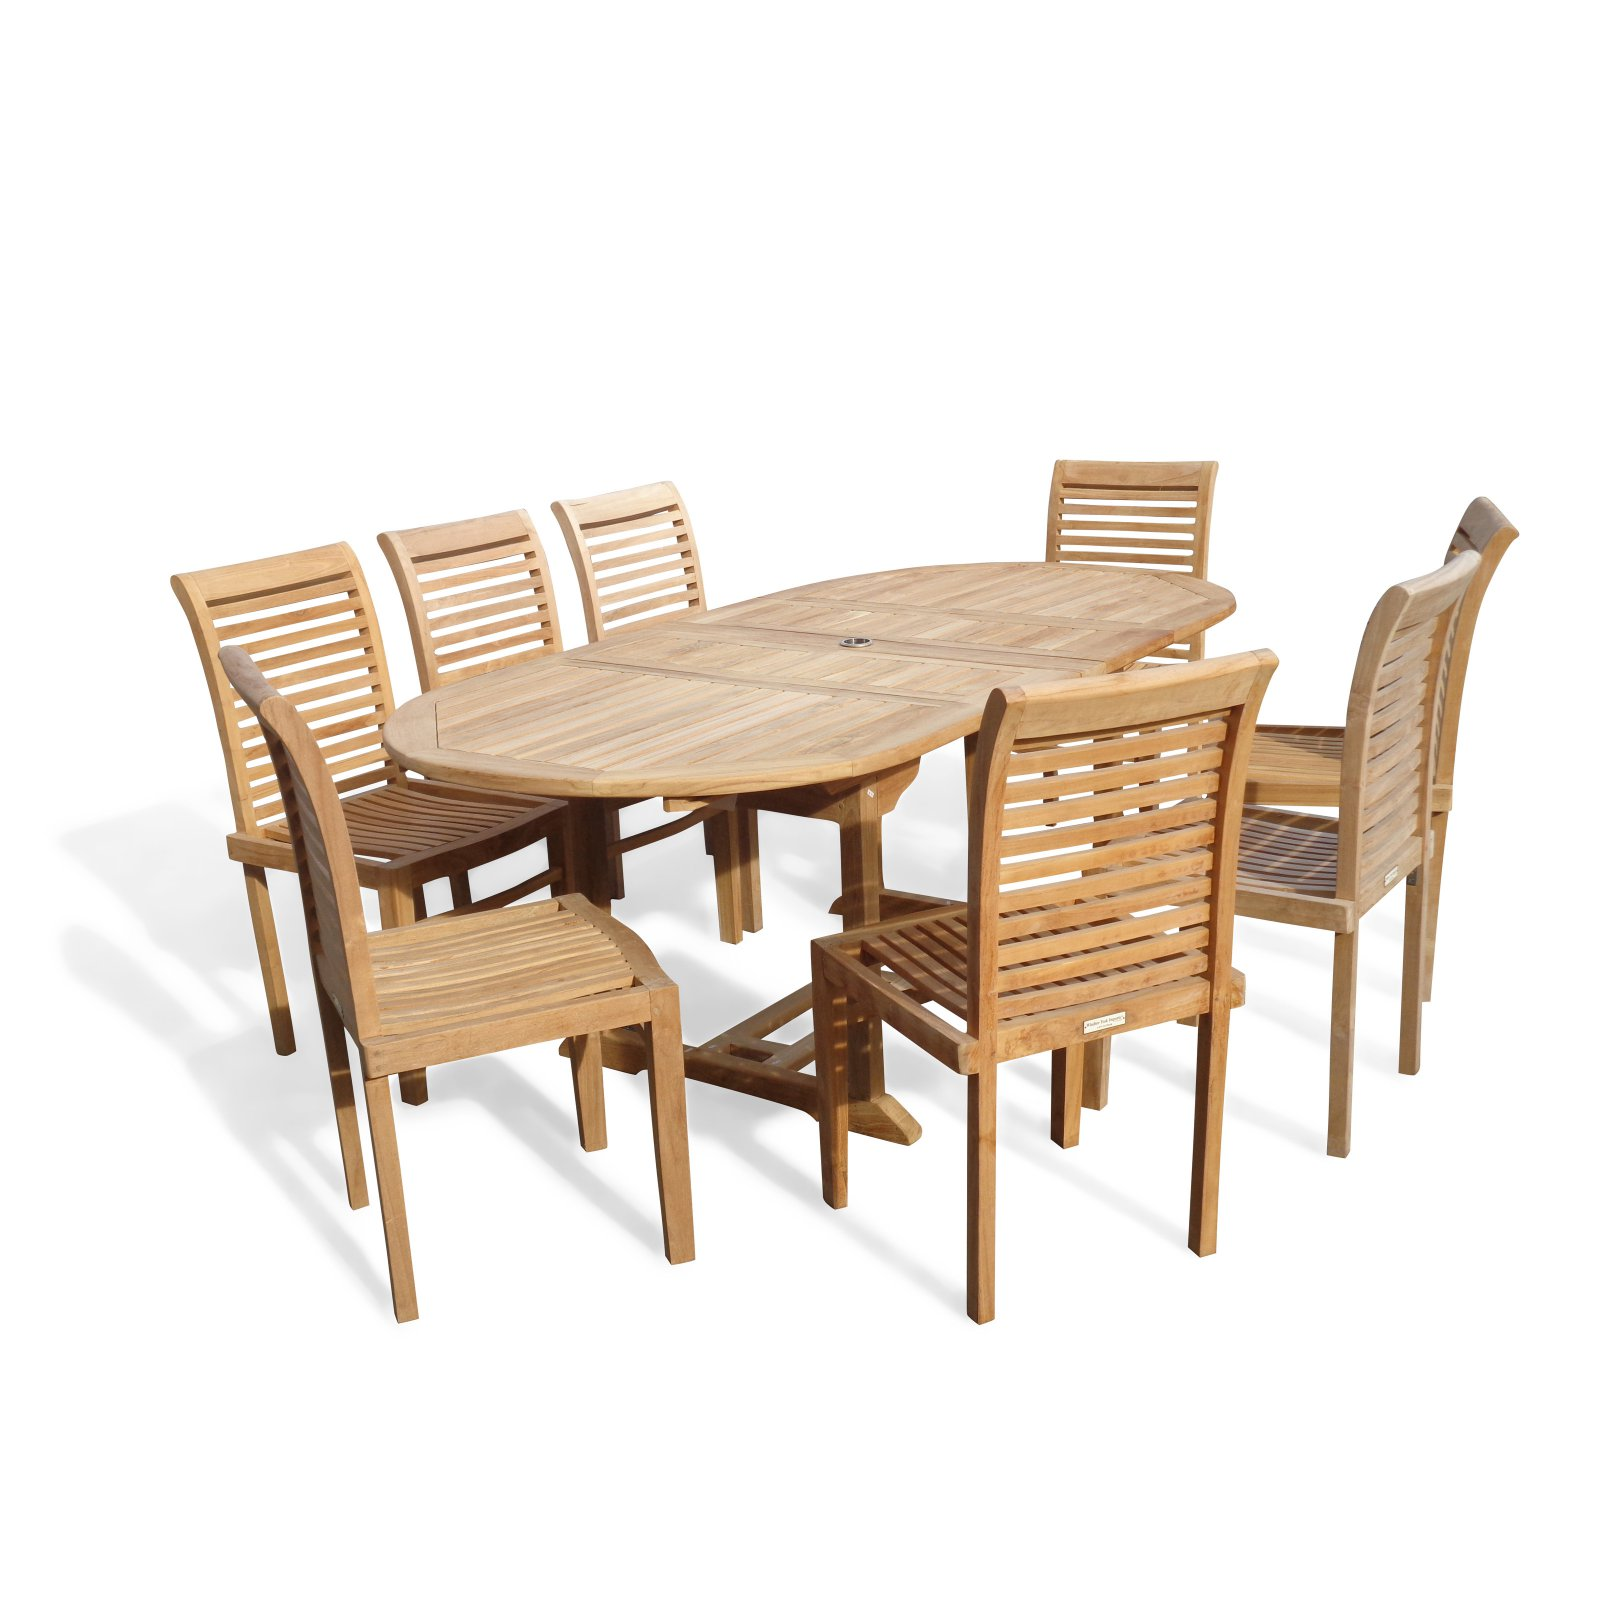 Windsor Teak Furniture Buckingham Grade A Teak 9 Piece Patio Dining Room Set by Windsor Teak Furniture